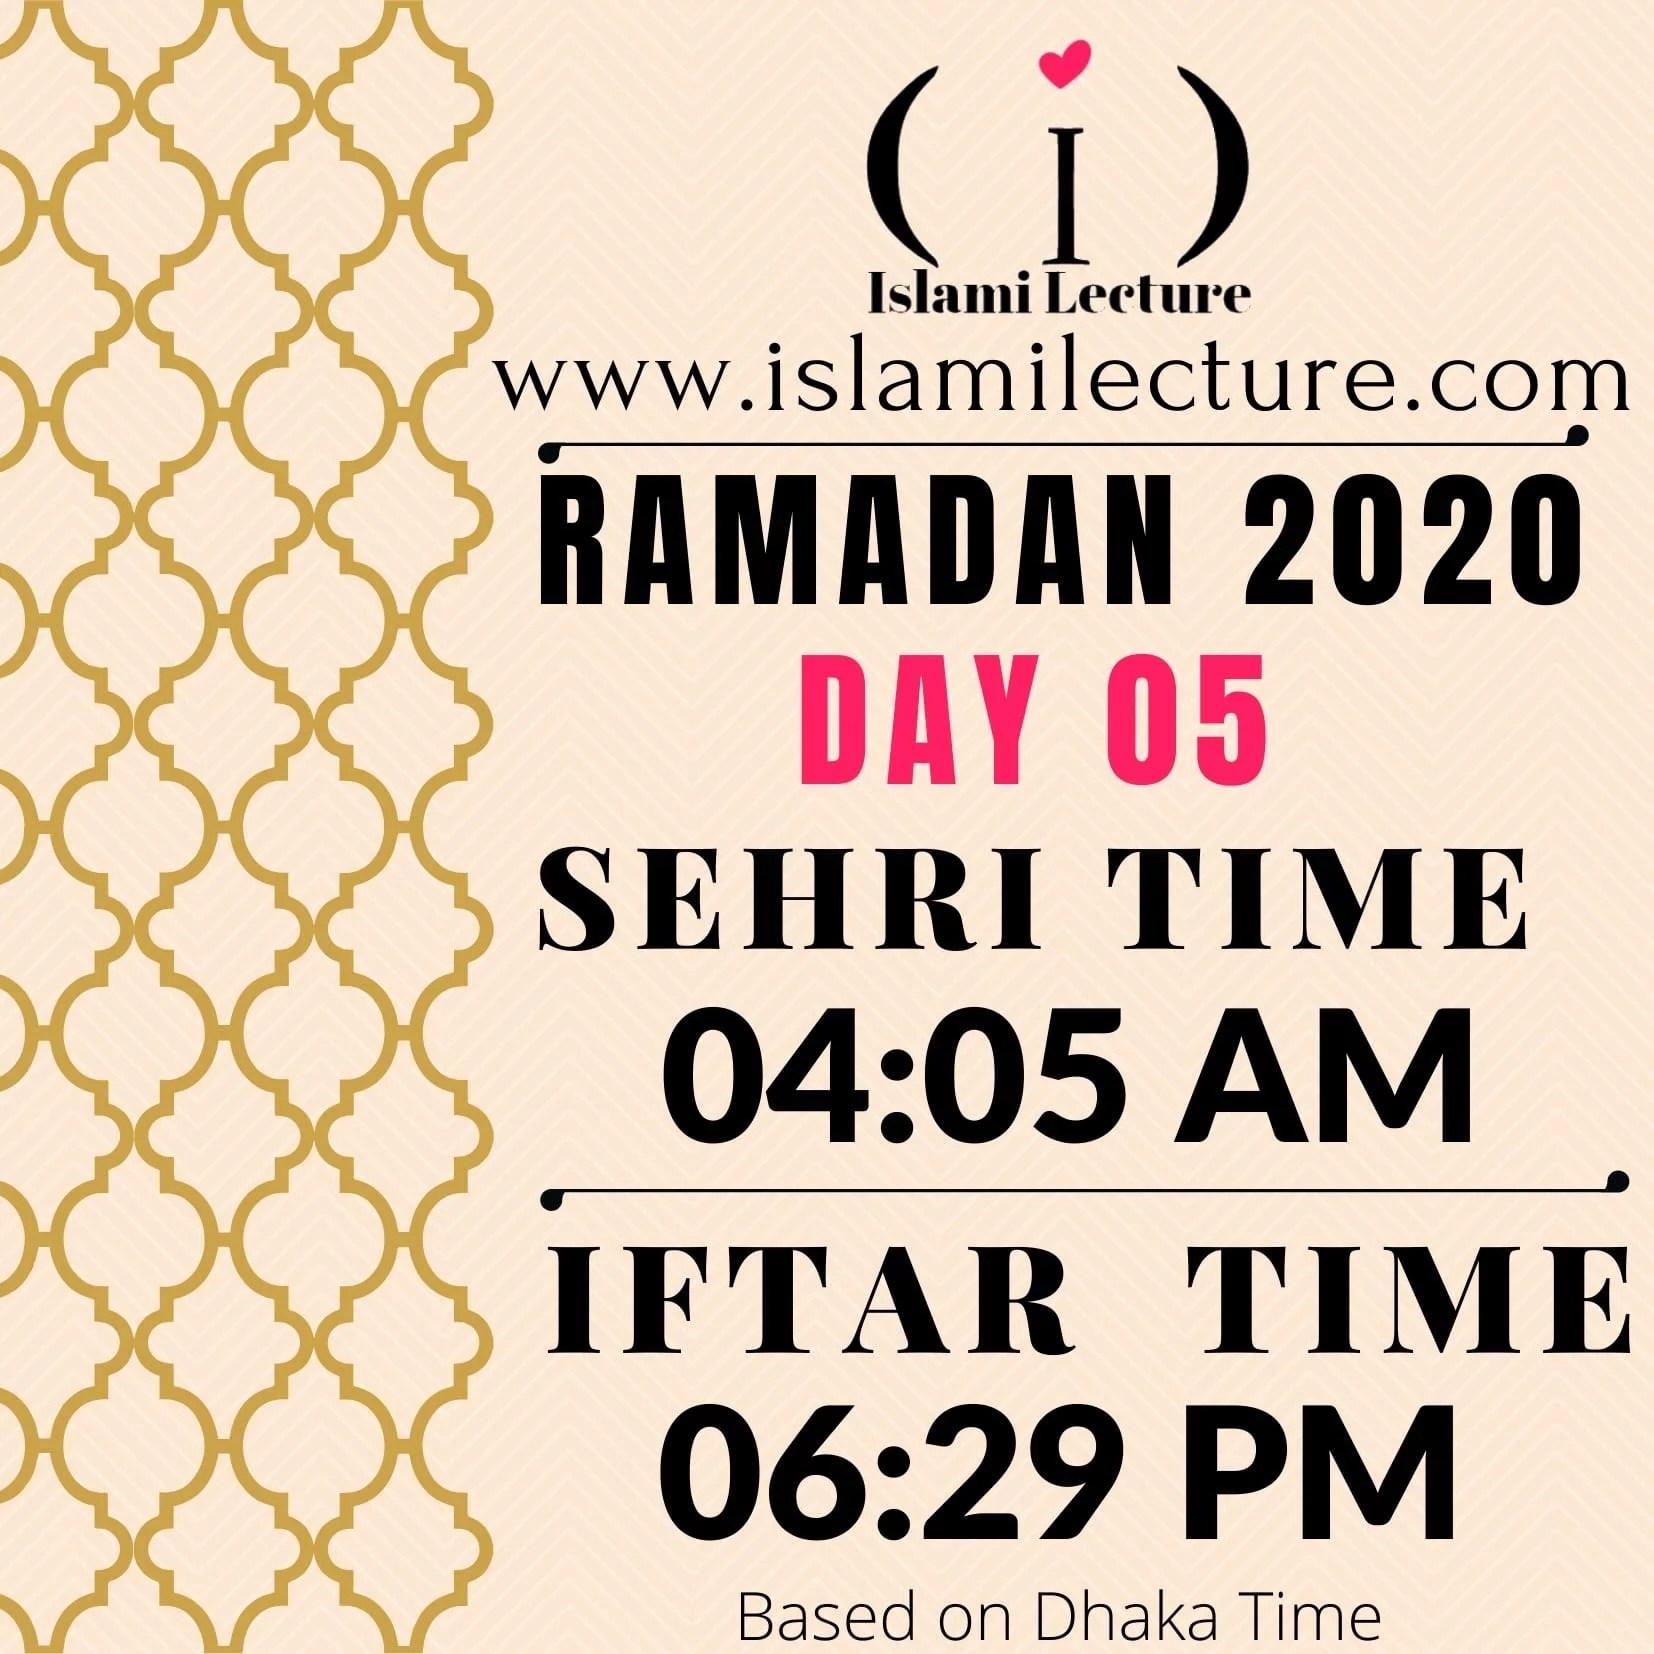 Dhaka Ramadan Time 2020 Sehri & Iftar Time (Day 05)